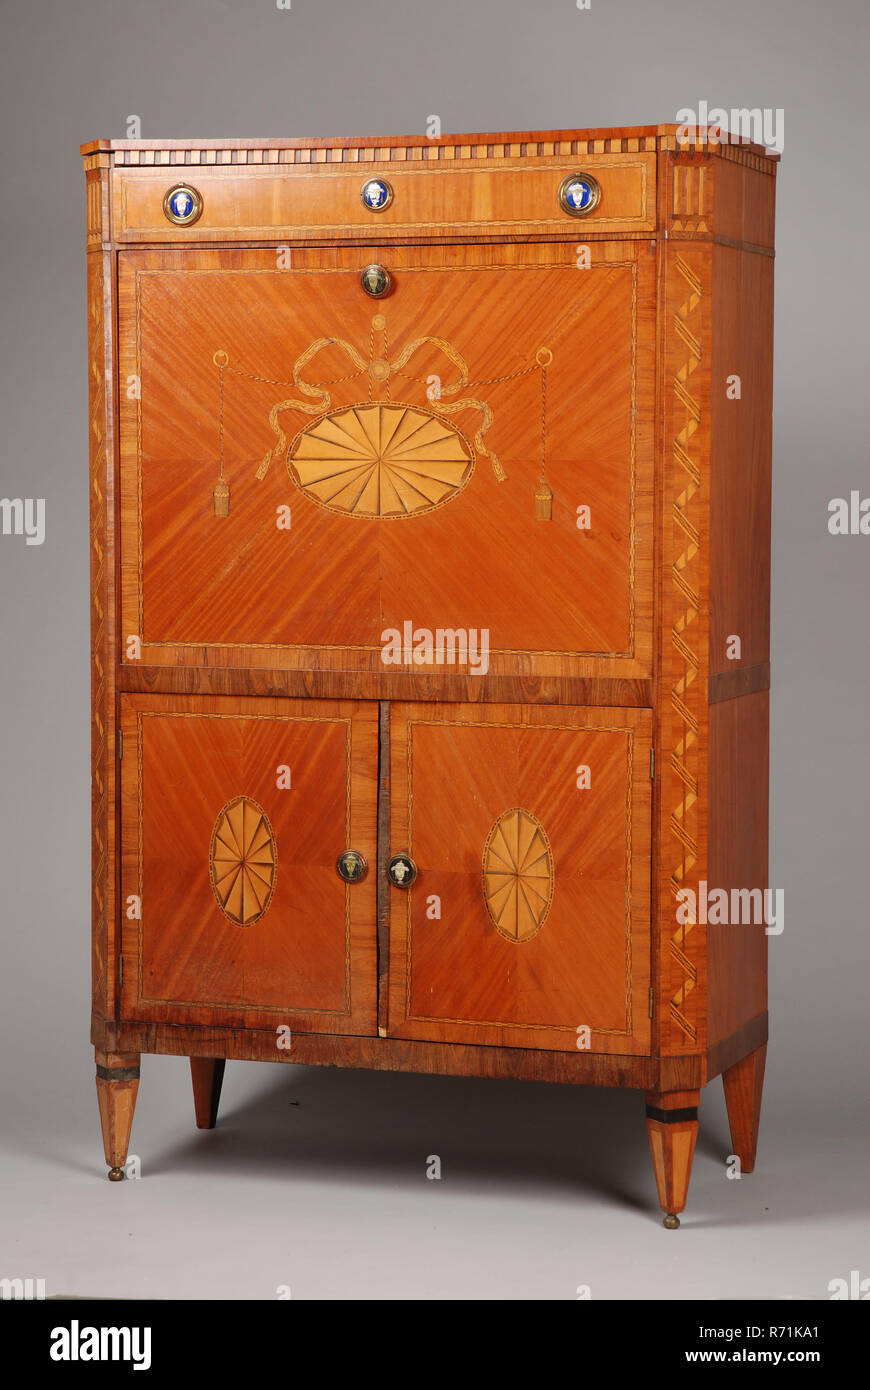 Oak louis seize secretaire secretary furniture furniture interiors wood oak mahogany lemon wood maple wood enamel louis seize oak secretary veneered with